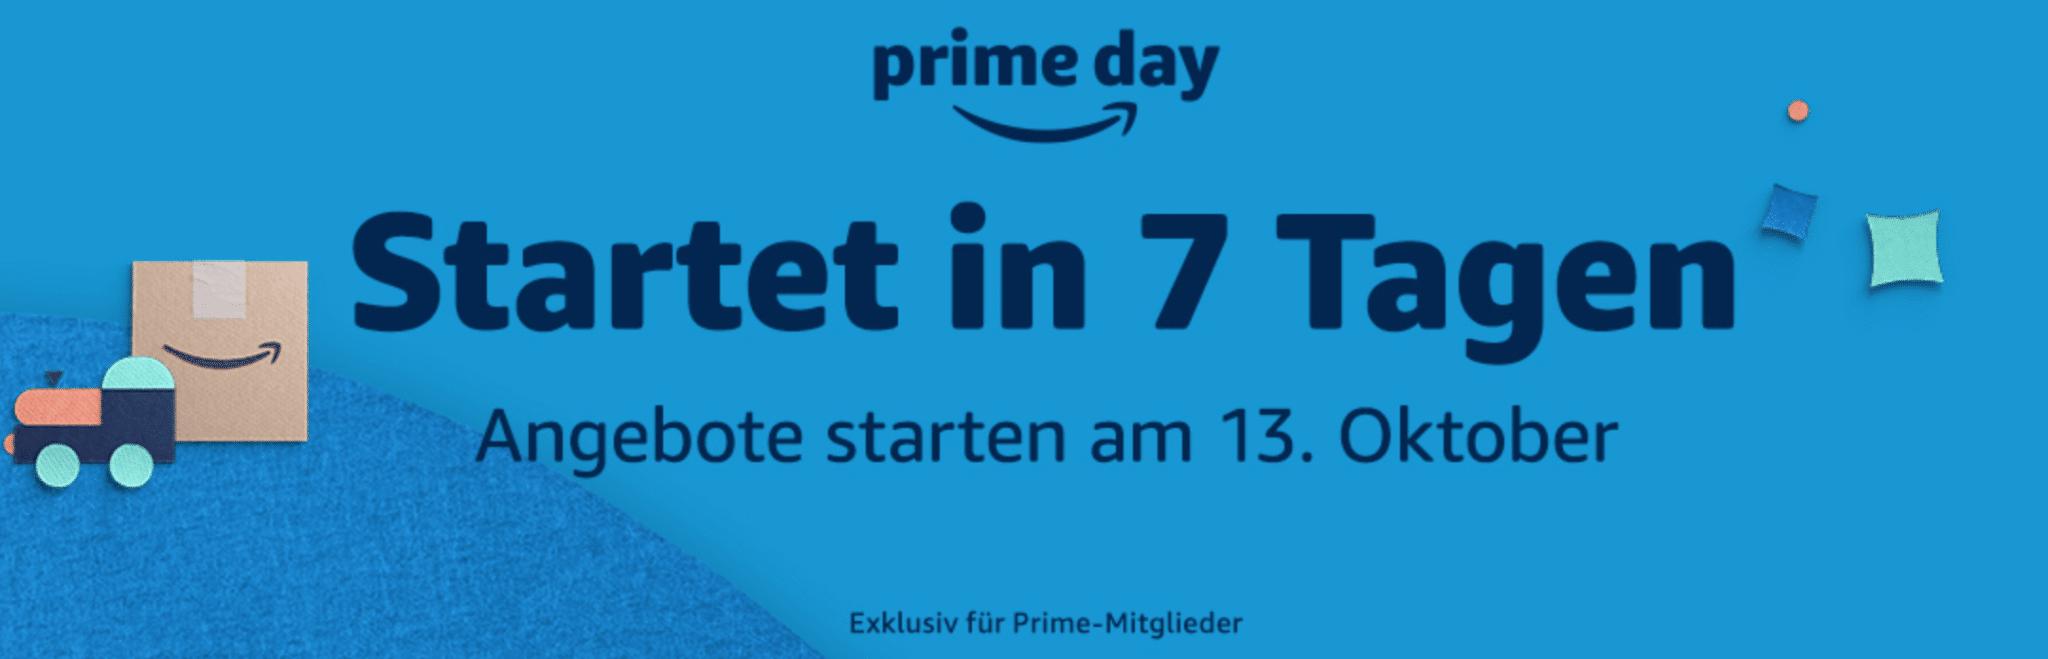 Amazon Prime Day 2020 Alle Informationen